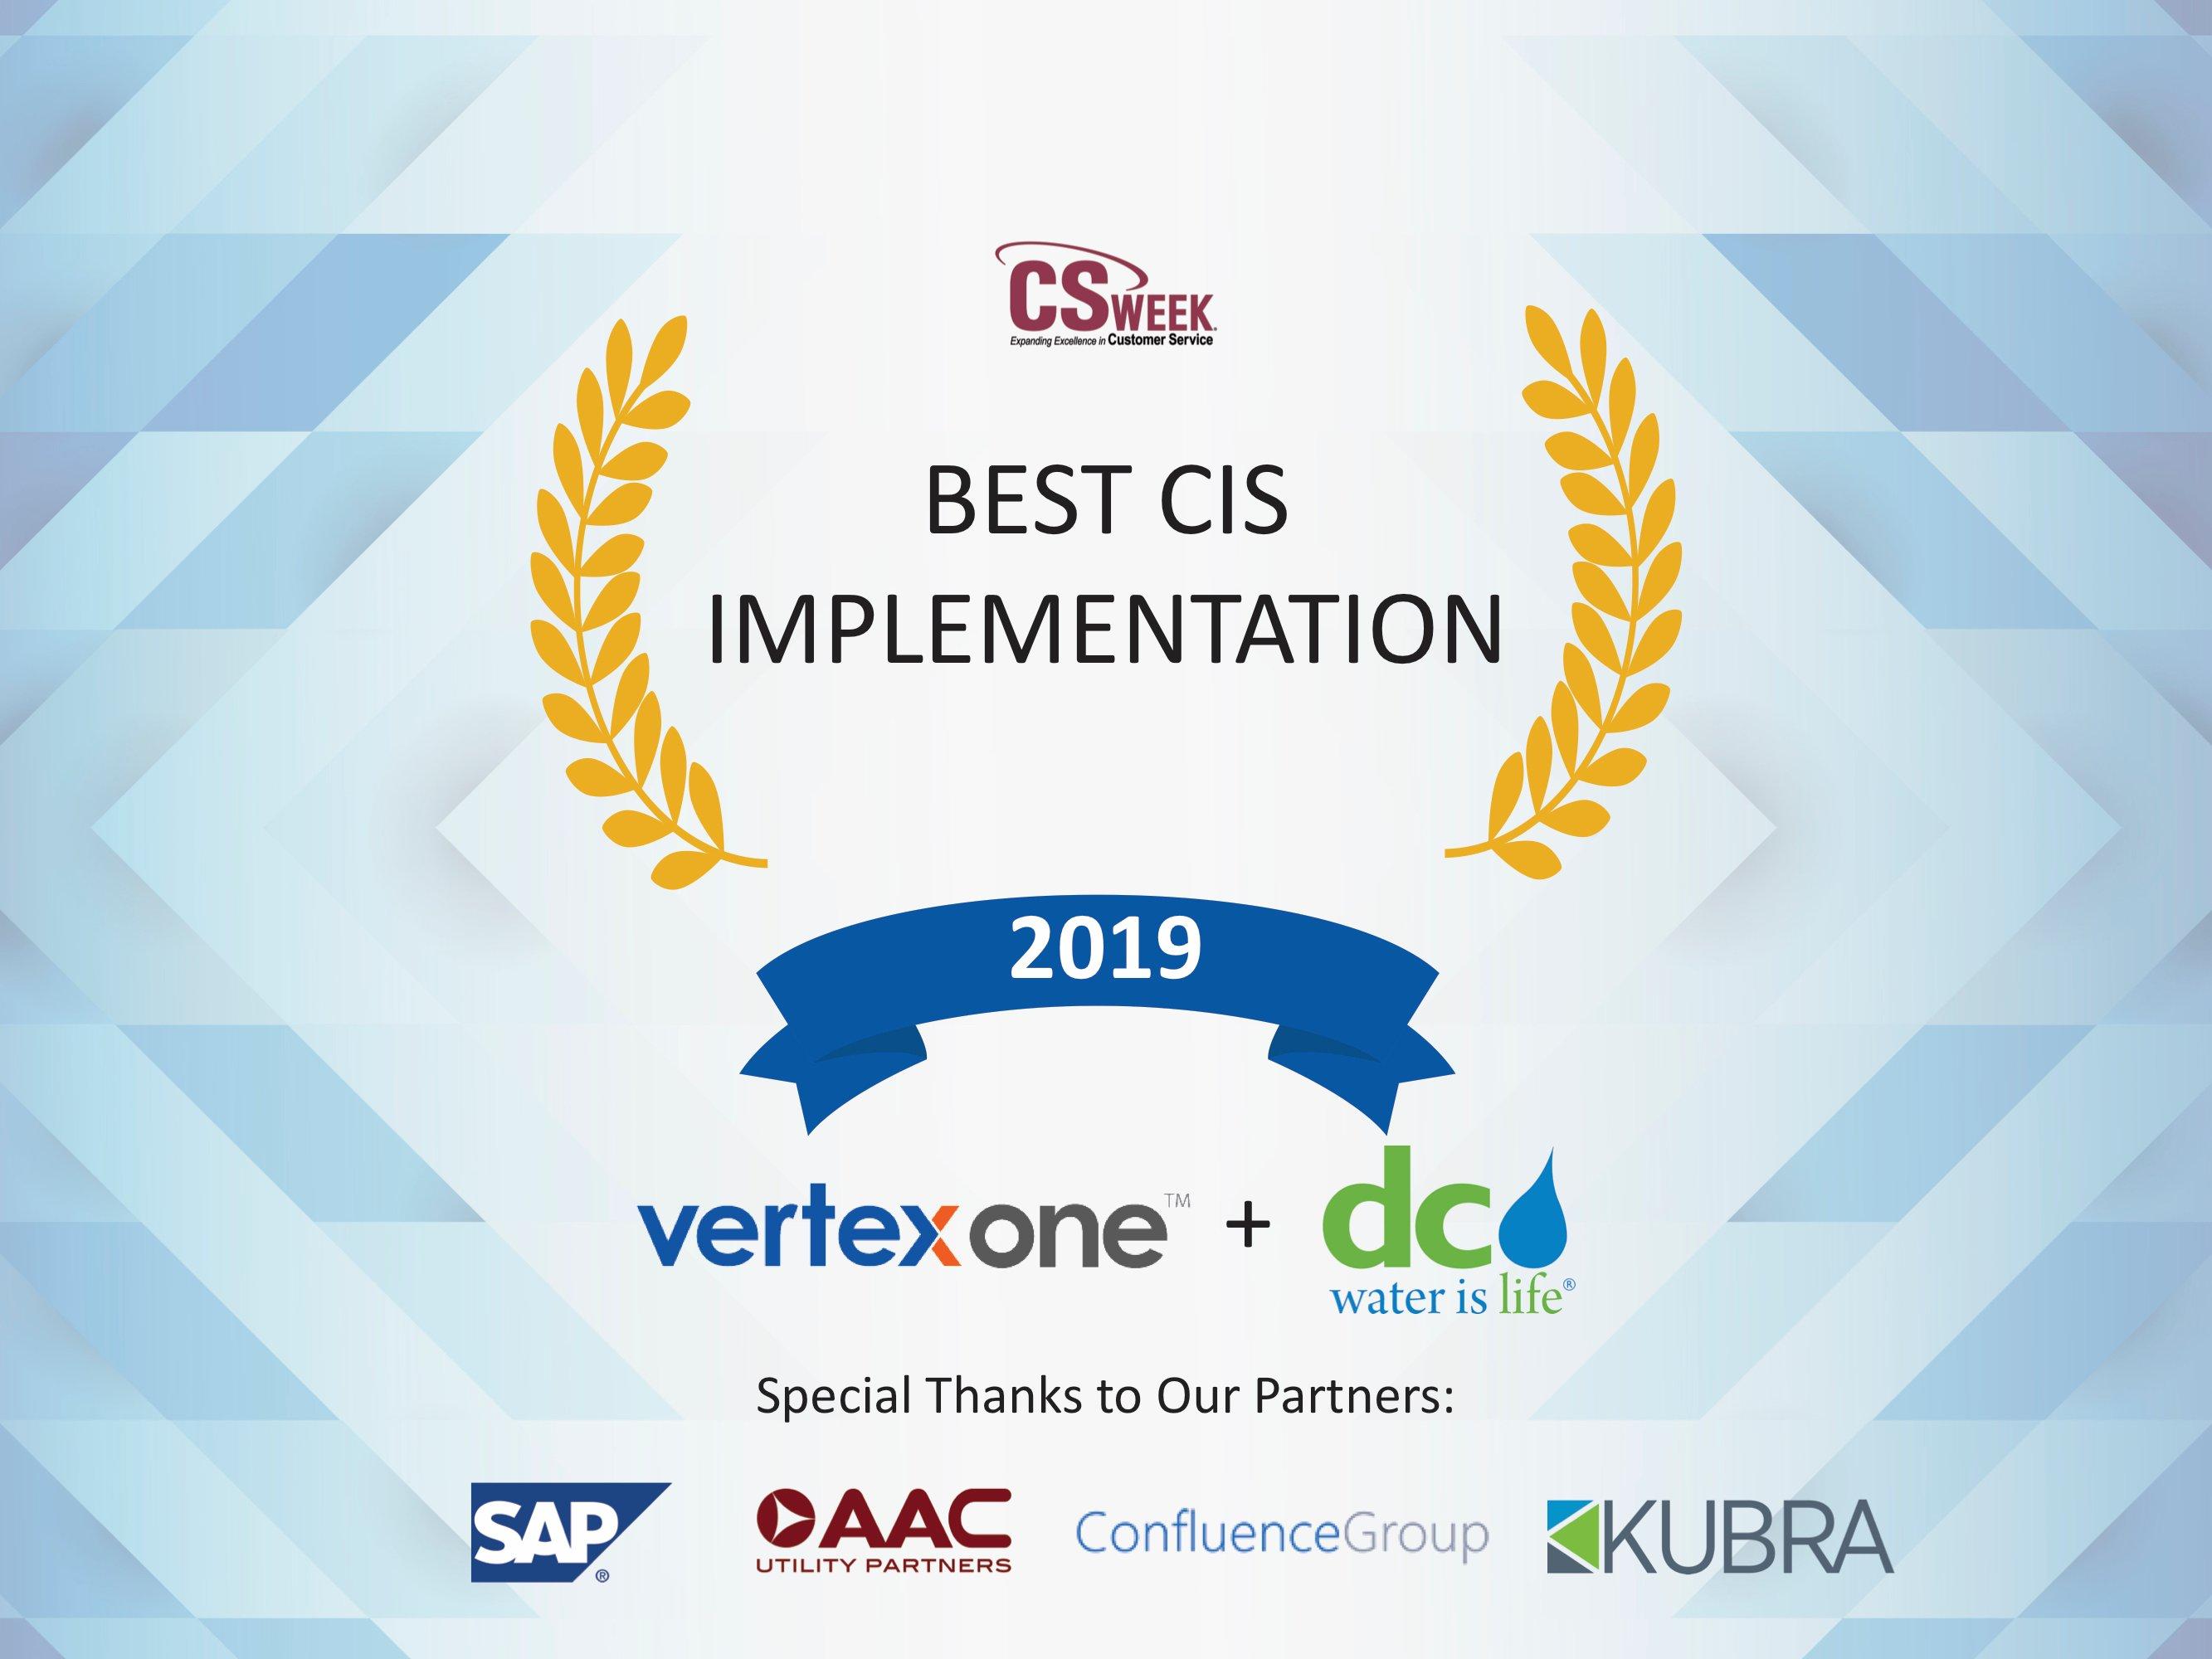 DC Water's VertexOne Customer Platform Initiative Recognized with Best CIS Implementation Award